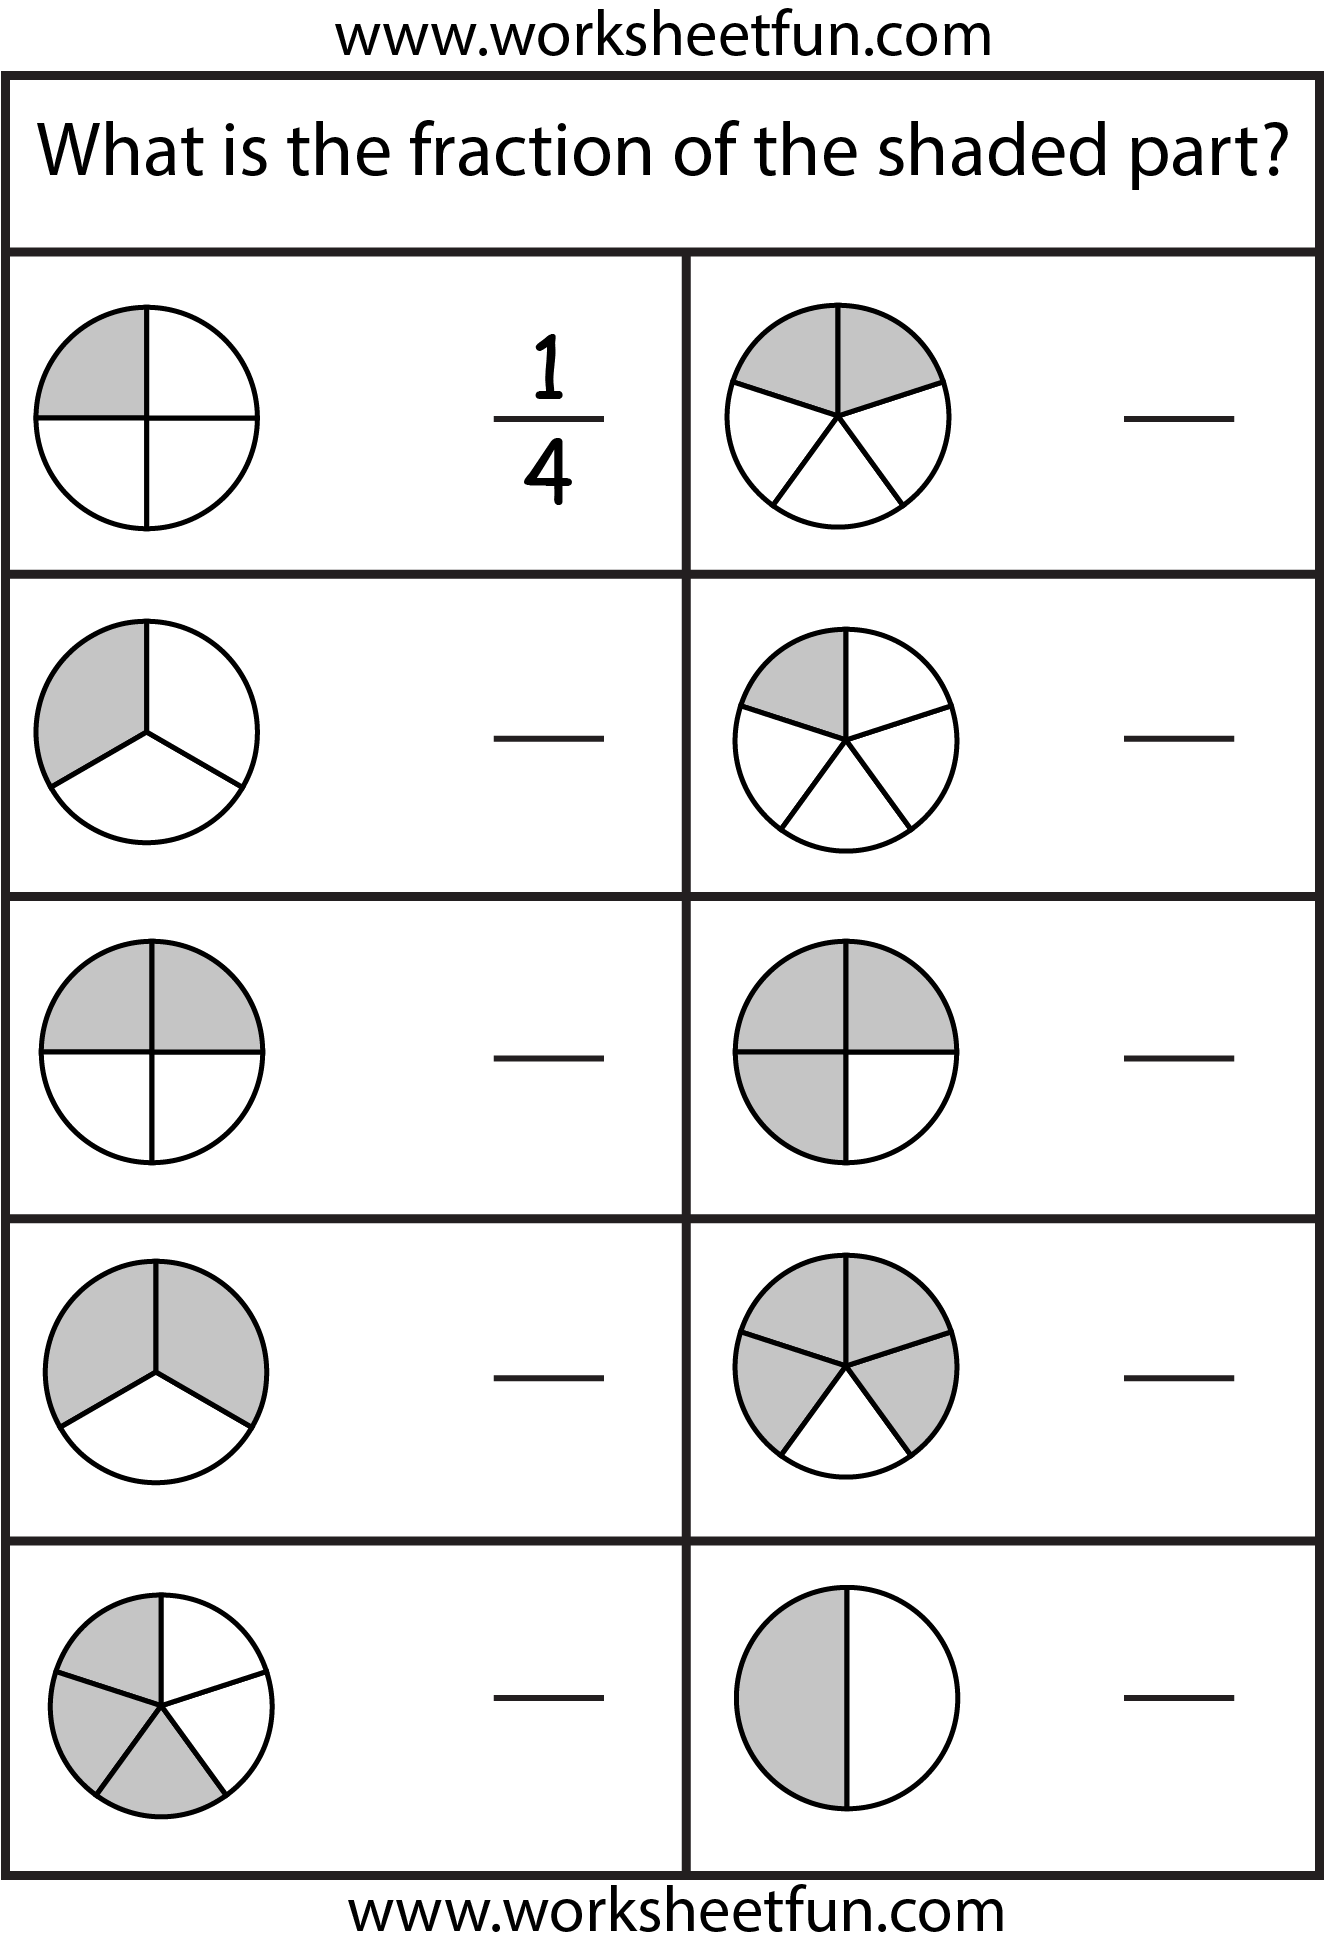 Free Fraction Worksheets   Math fractions worksheets [ 1948 x 1324 Pixel ]